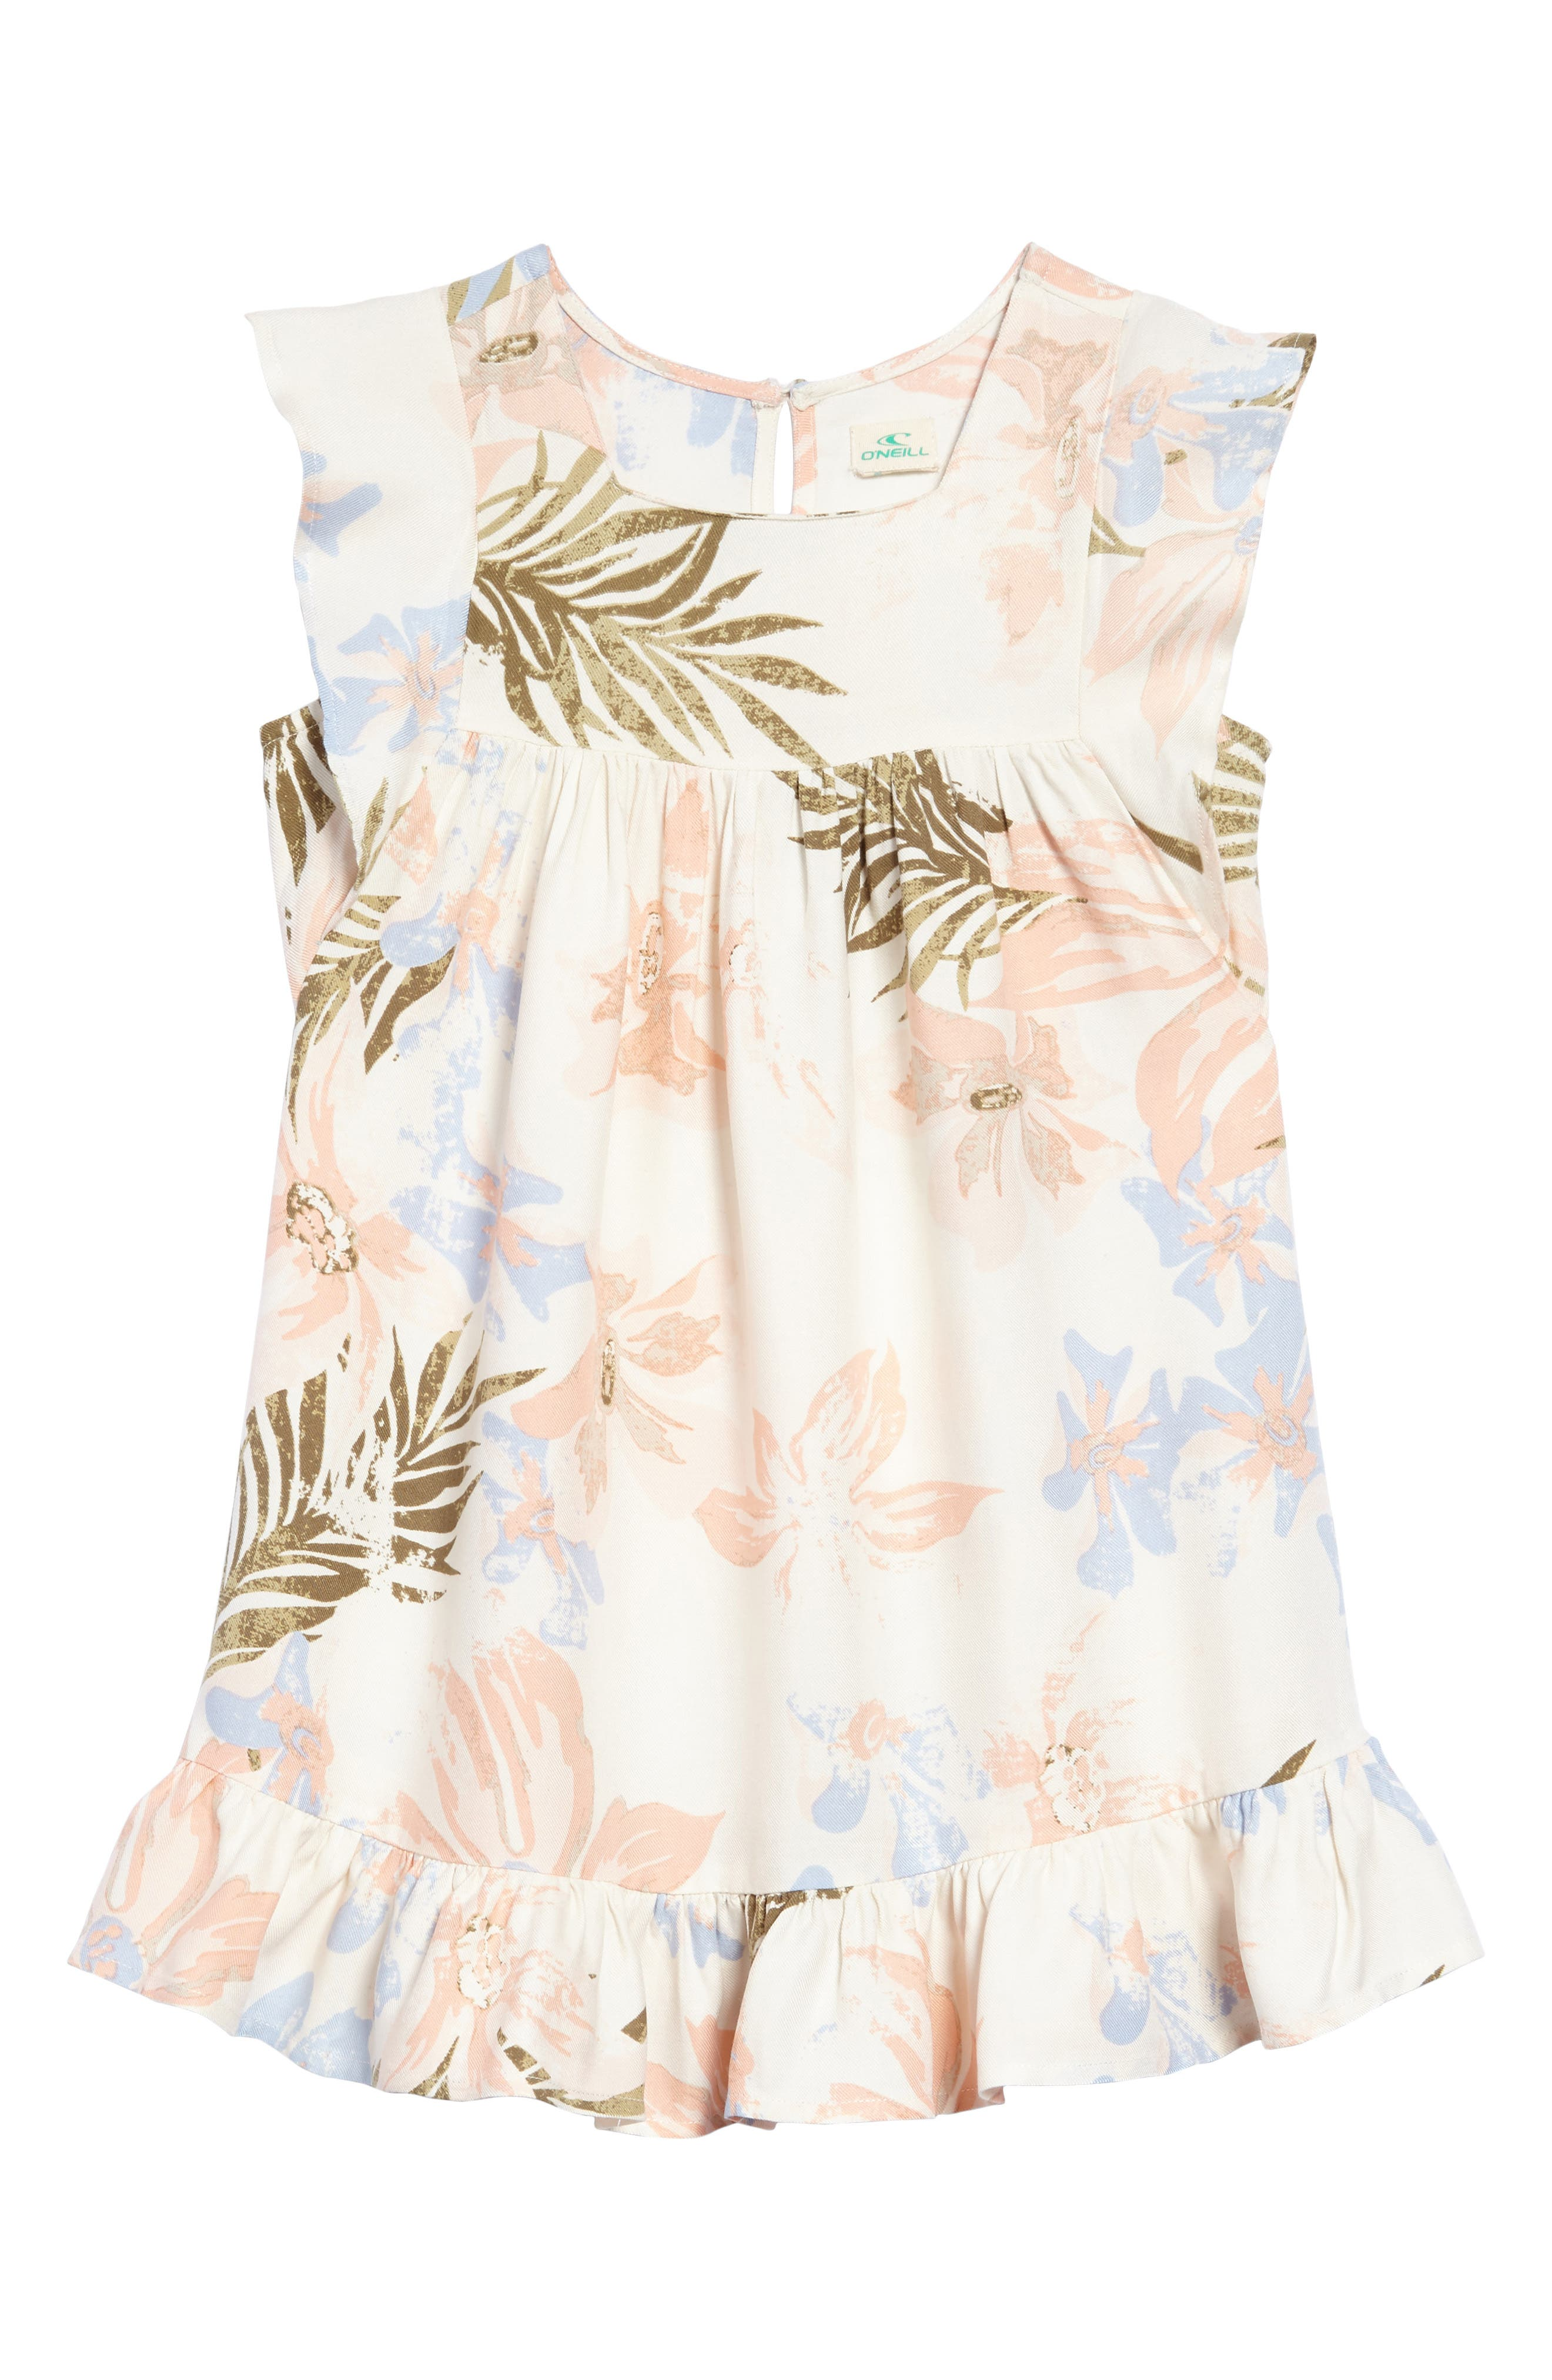 Alternate Image 1 Selected - O'Neill Britt Flutter Sleeve Dress (Toddler Girls & Little Girls)